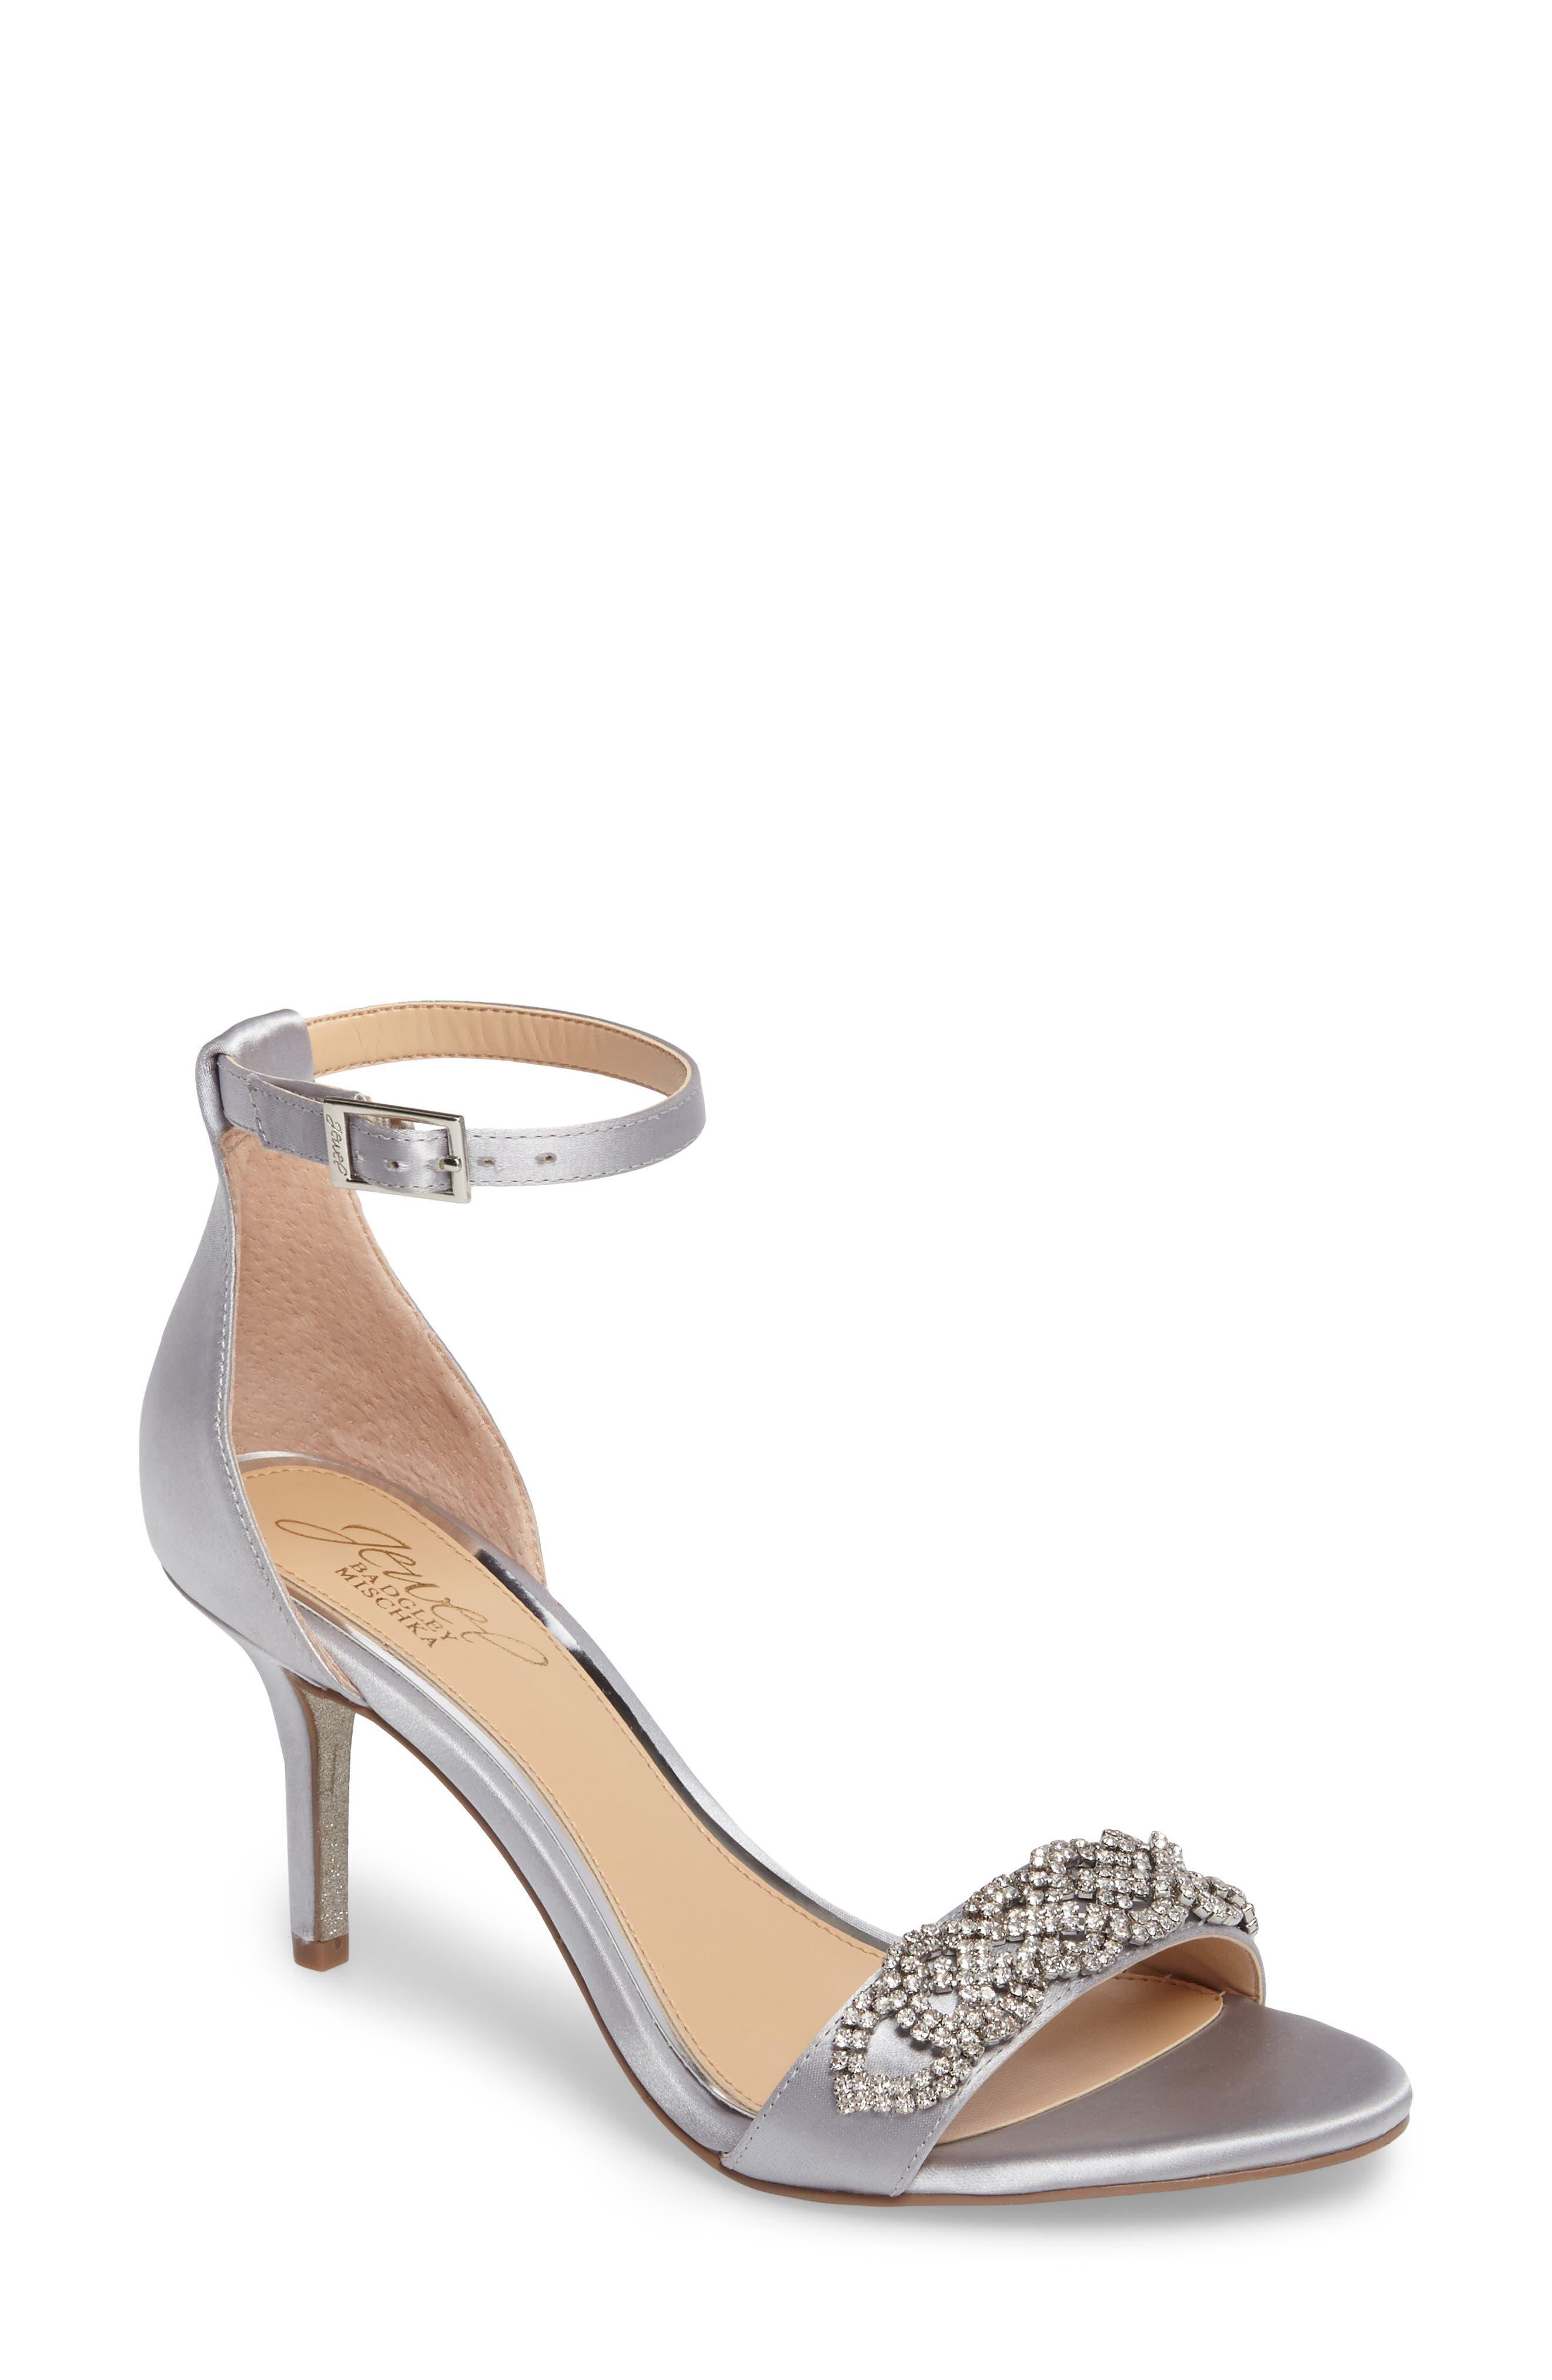 Jewel Badgley Mischka Alana Ankle Strap Sandal (Women)